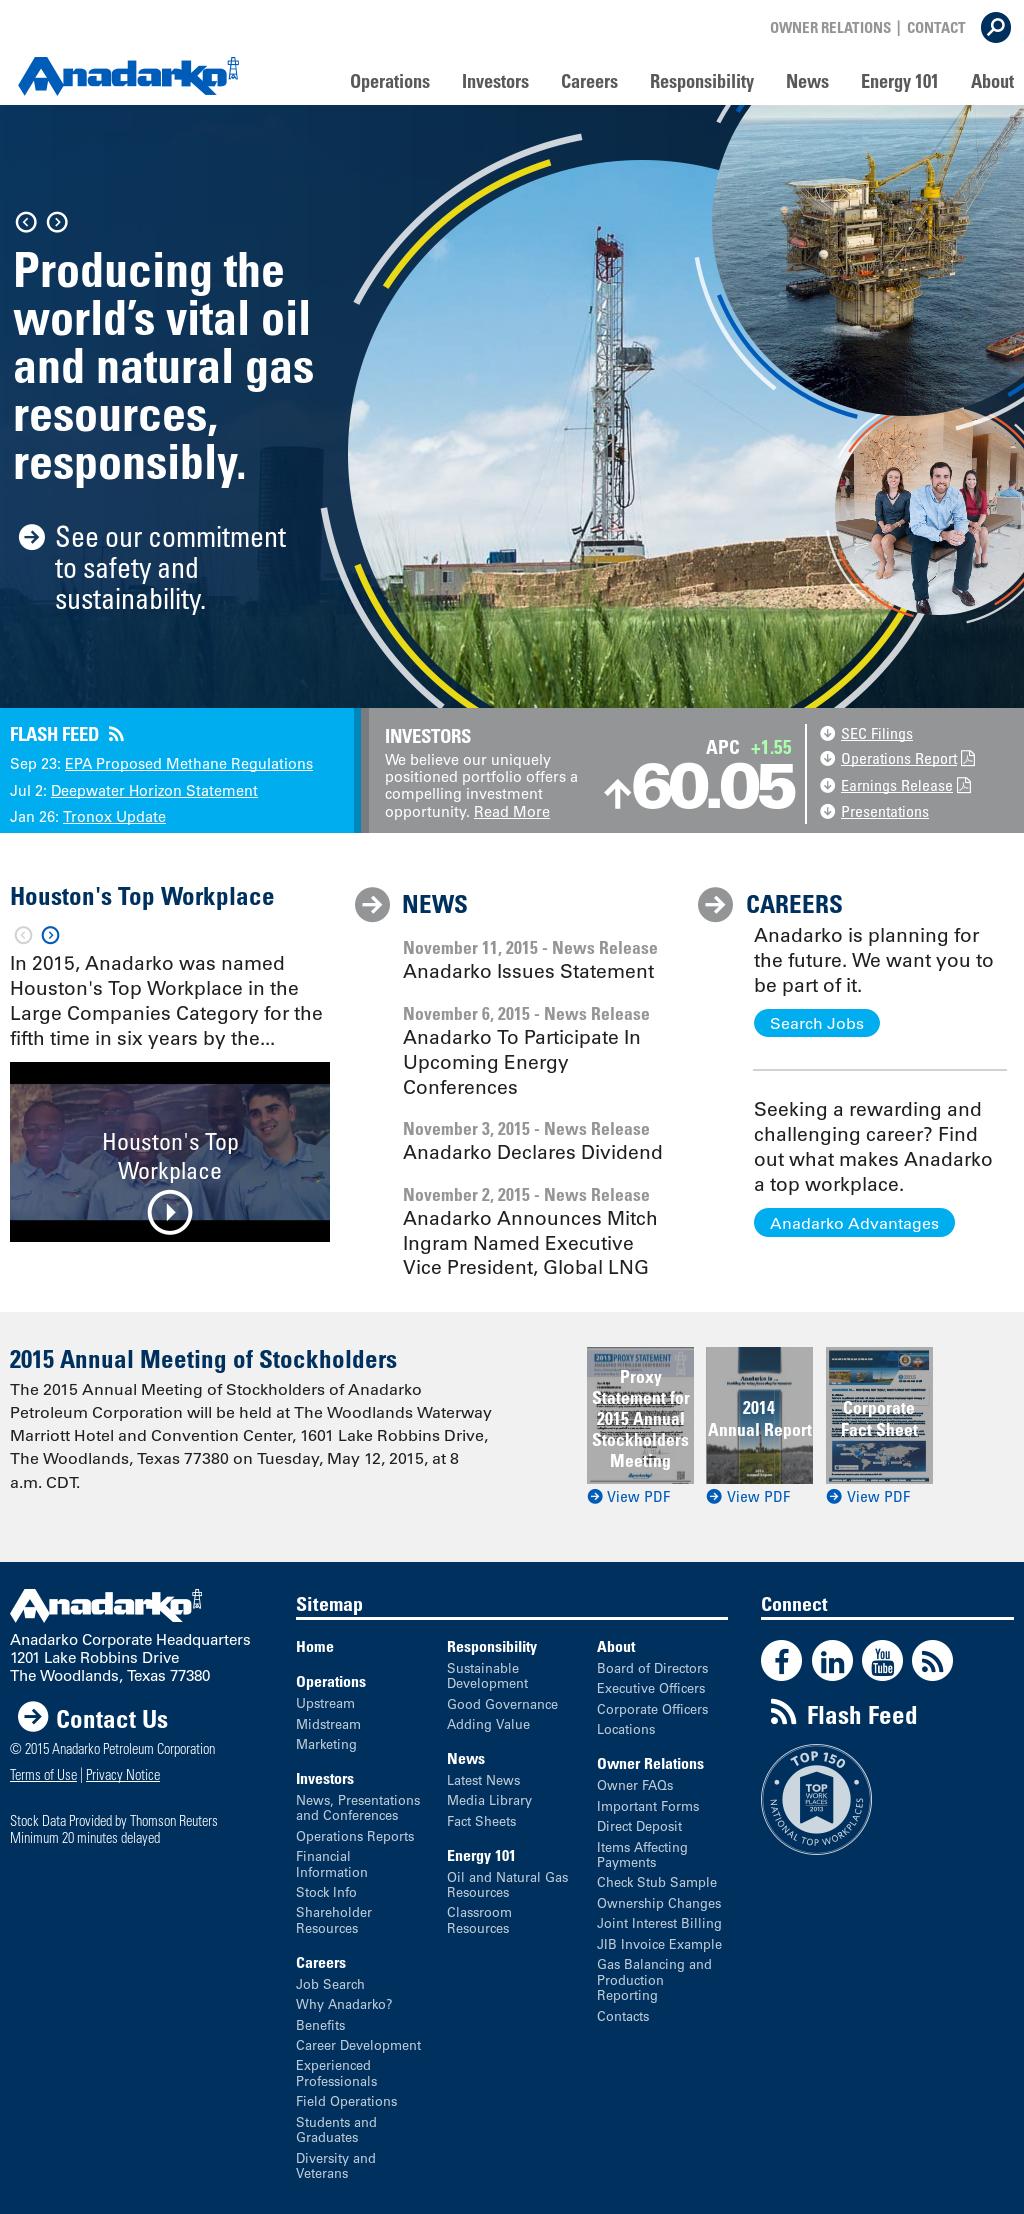 Anadarko Competitors, Revenue and Employees - Owler Company